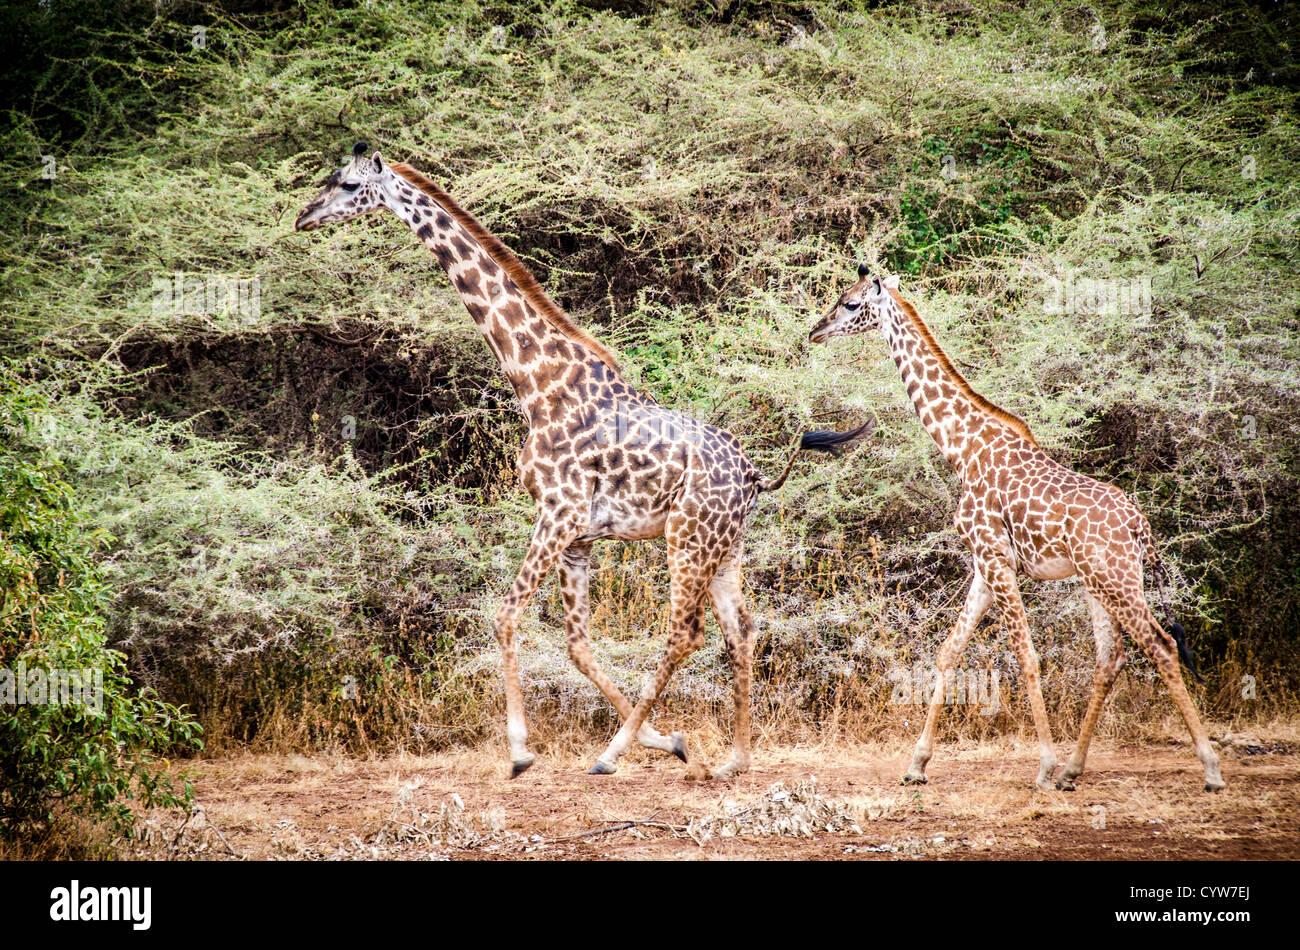 LAKE MANYARA NATIONAL PARK, Tanzania - Two giraffes walk through the bush of Lake Manyara National Park in northern - Stock Image